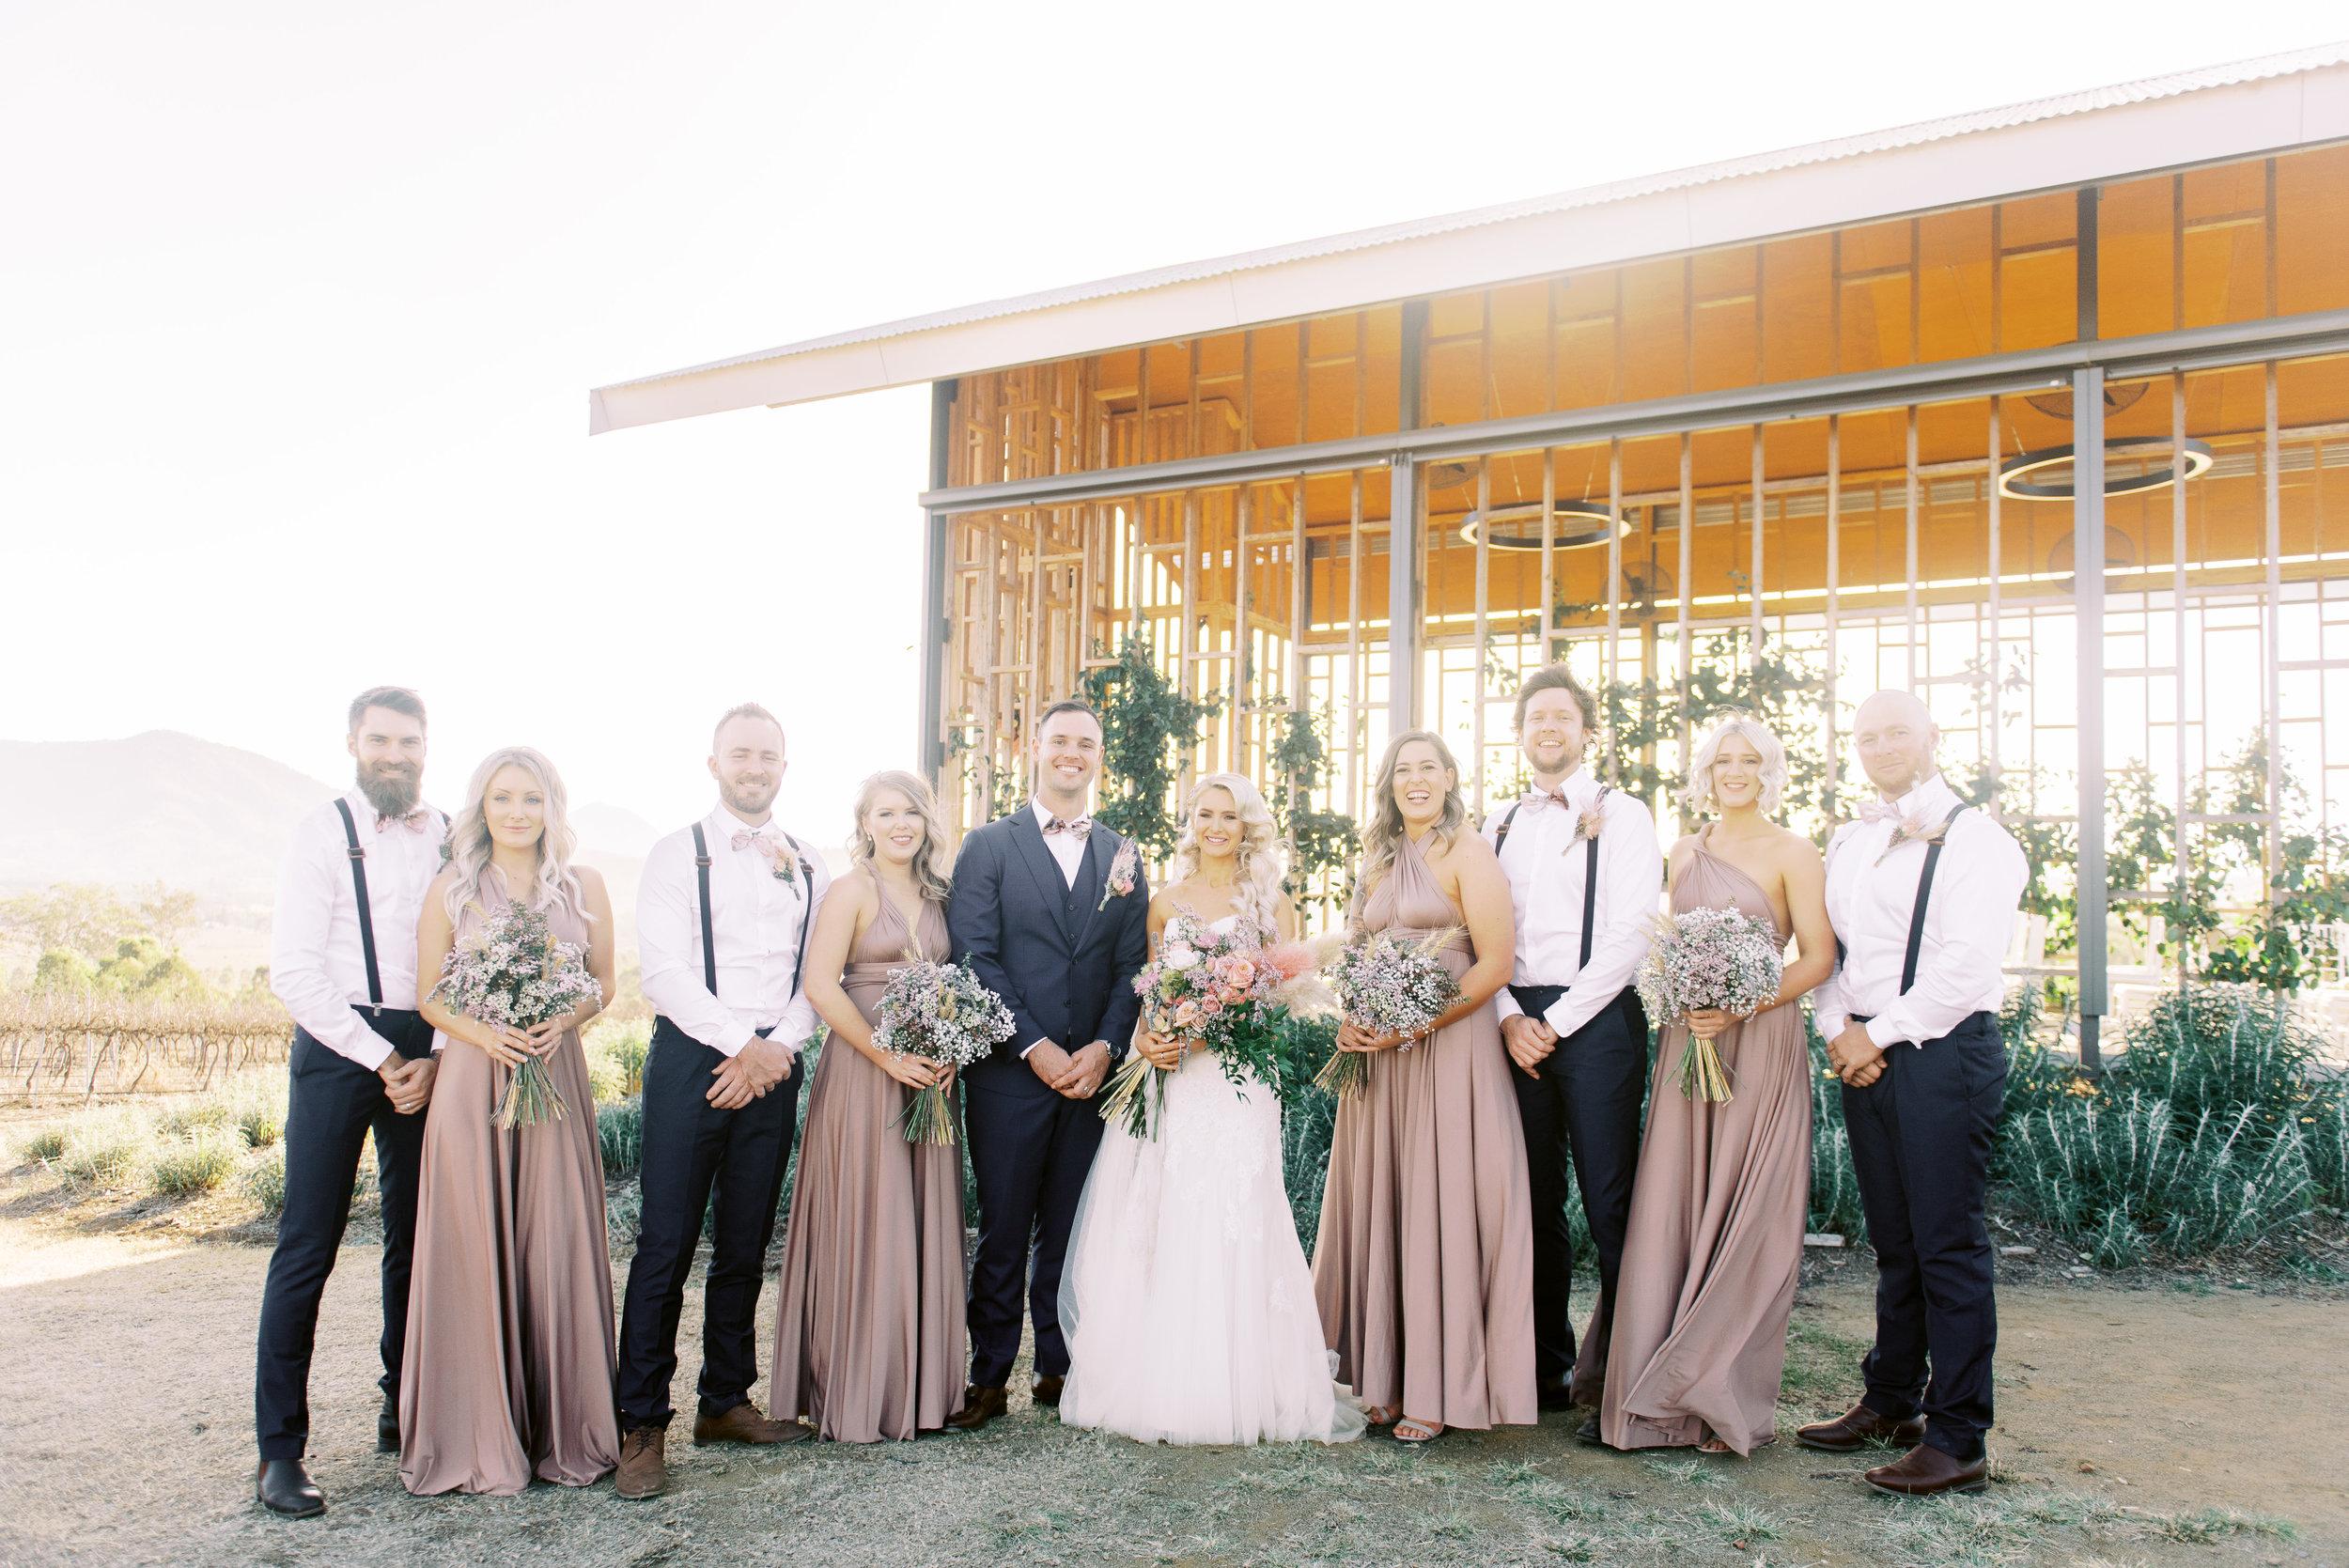 Kooroomba-Vineyard-Lavender-Farm-Wedding-Fine-Art-Lauren-Olivia-48.jpg